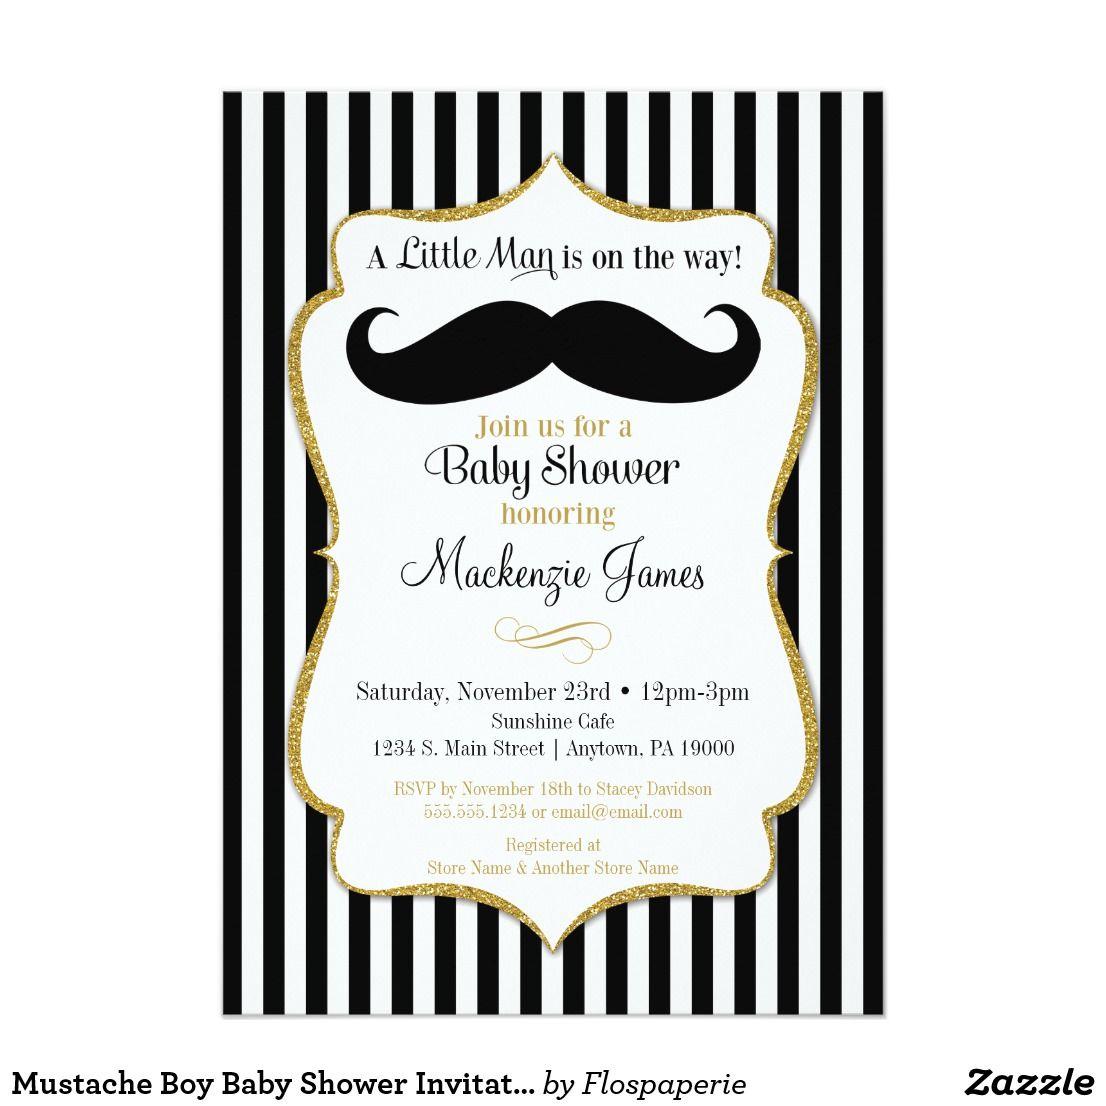 Mustache Boy Baby Shower Invitation Black Gold | Boy baby showers ...